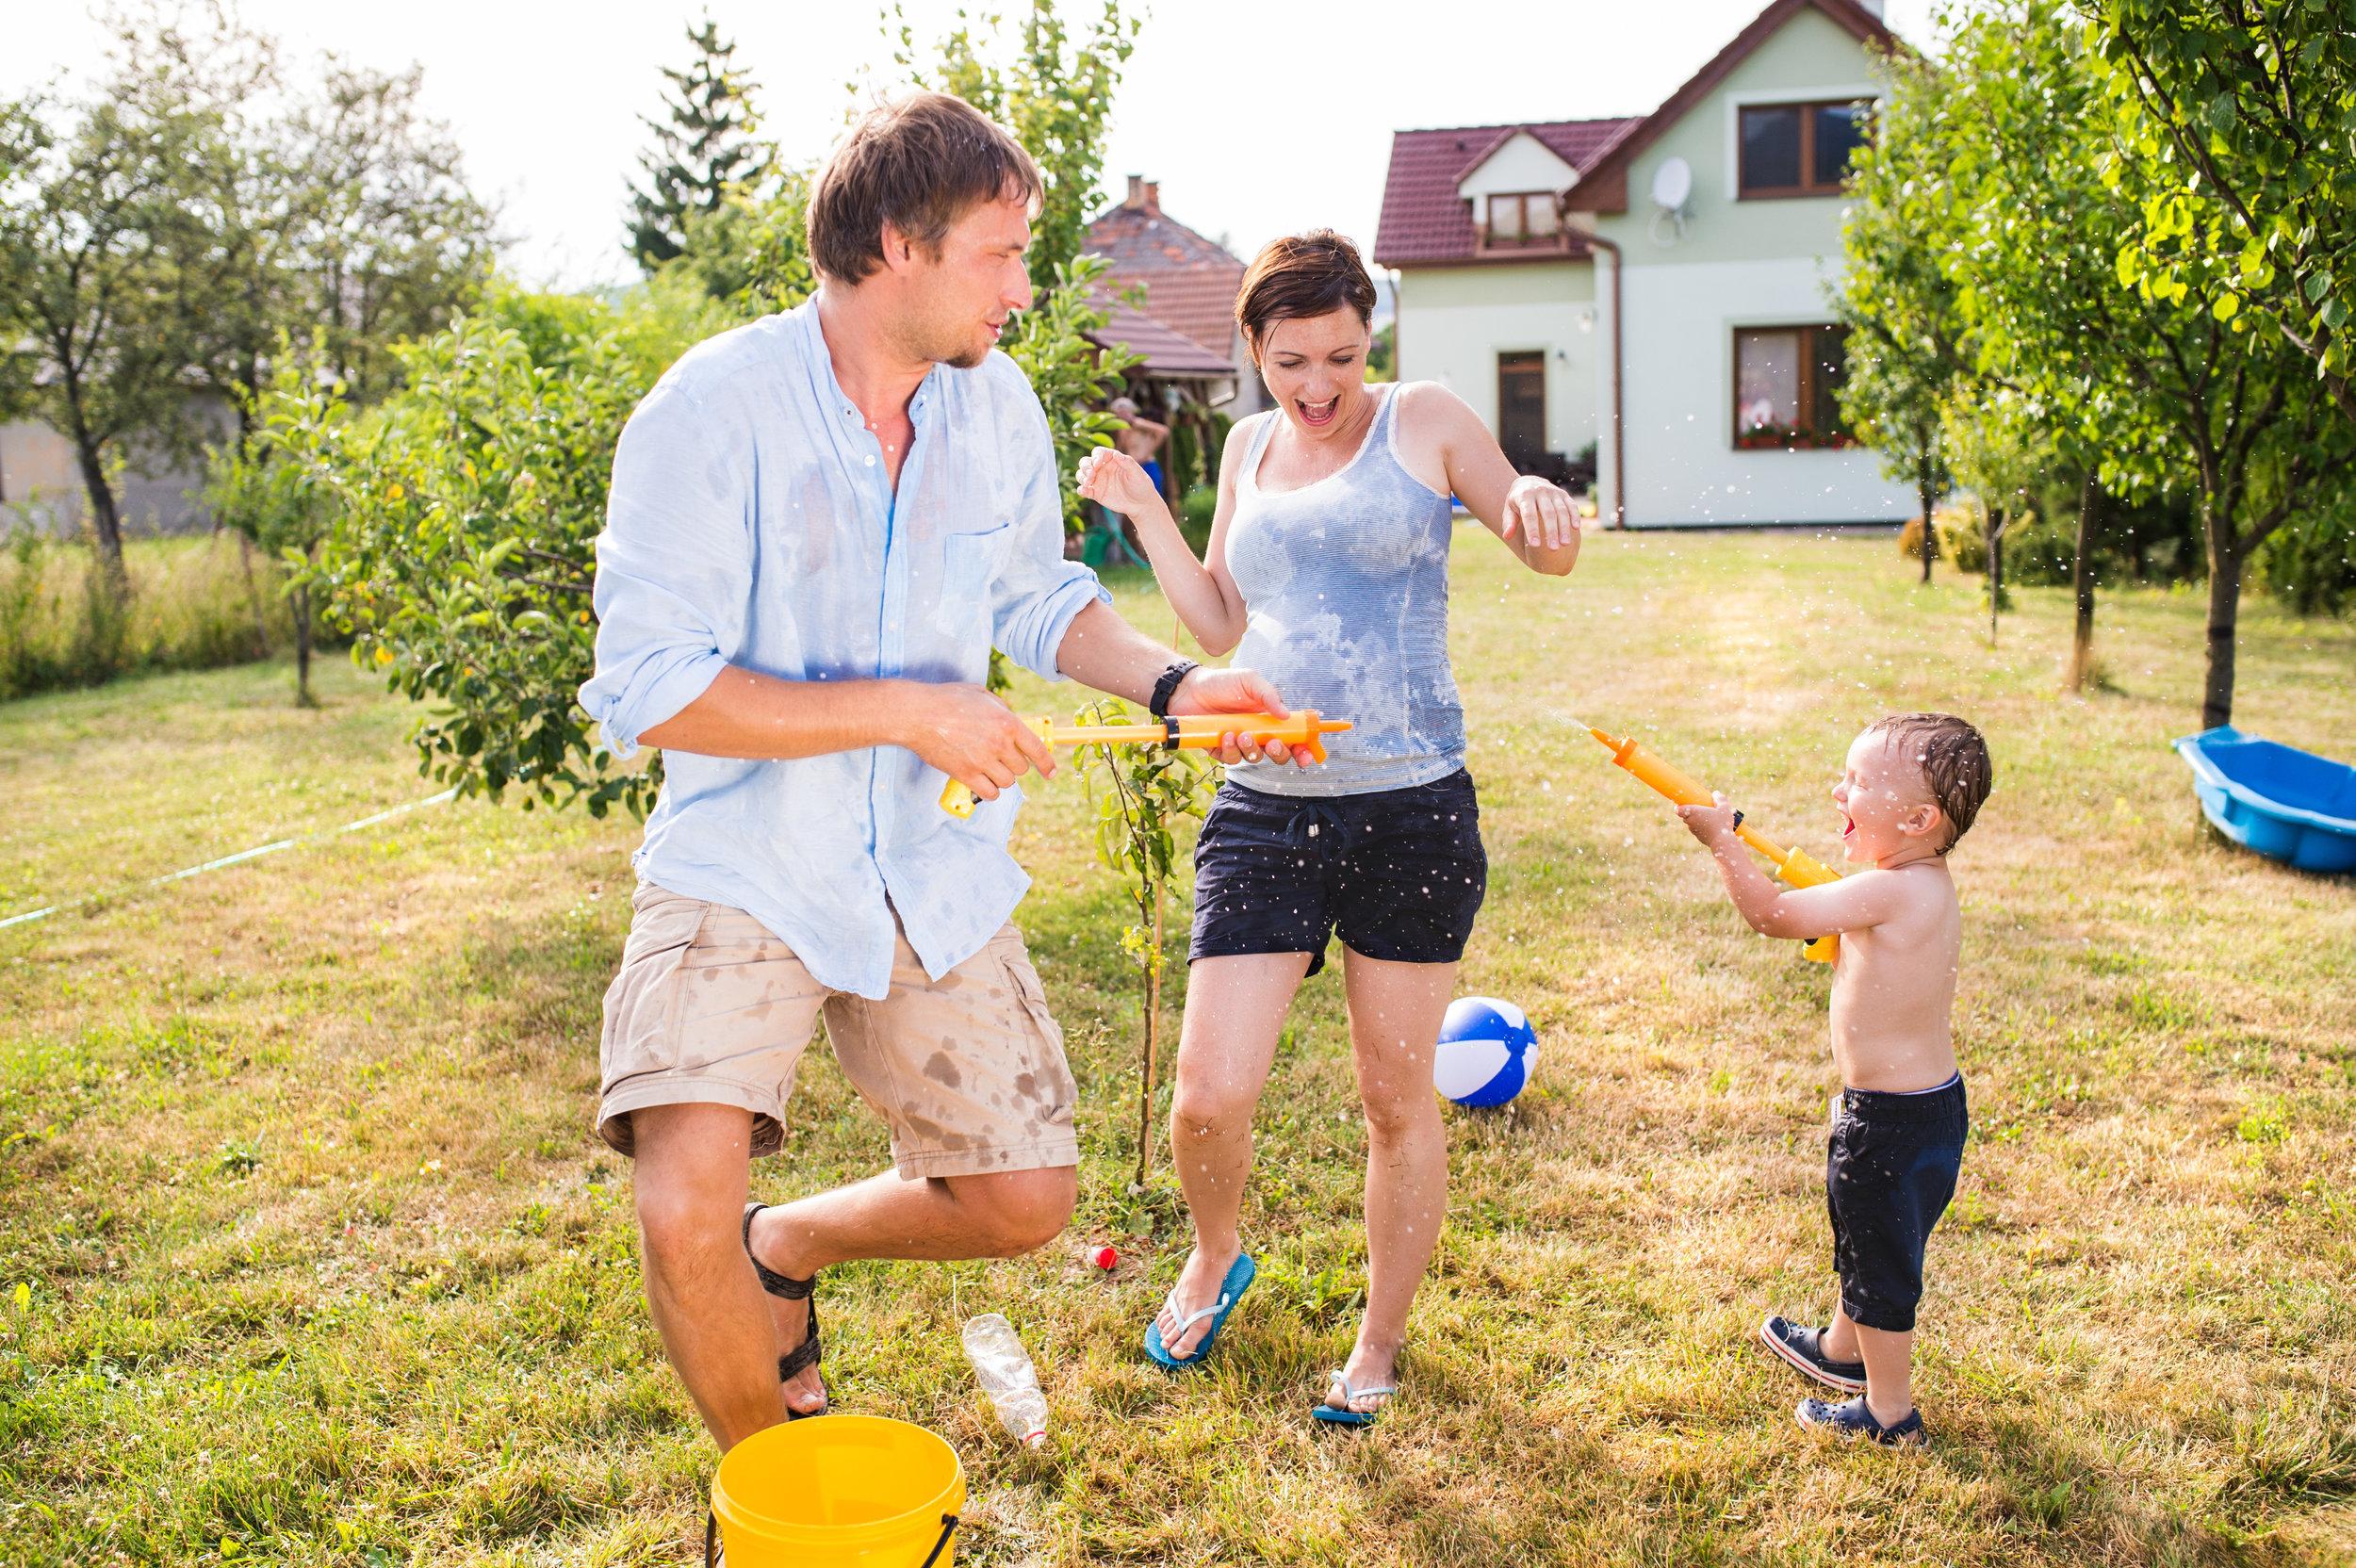 Homeowners Insurance - Keystone Insurance Associates